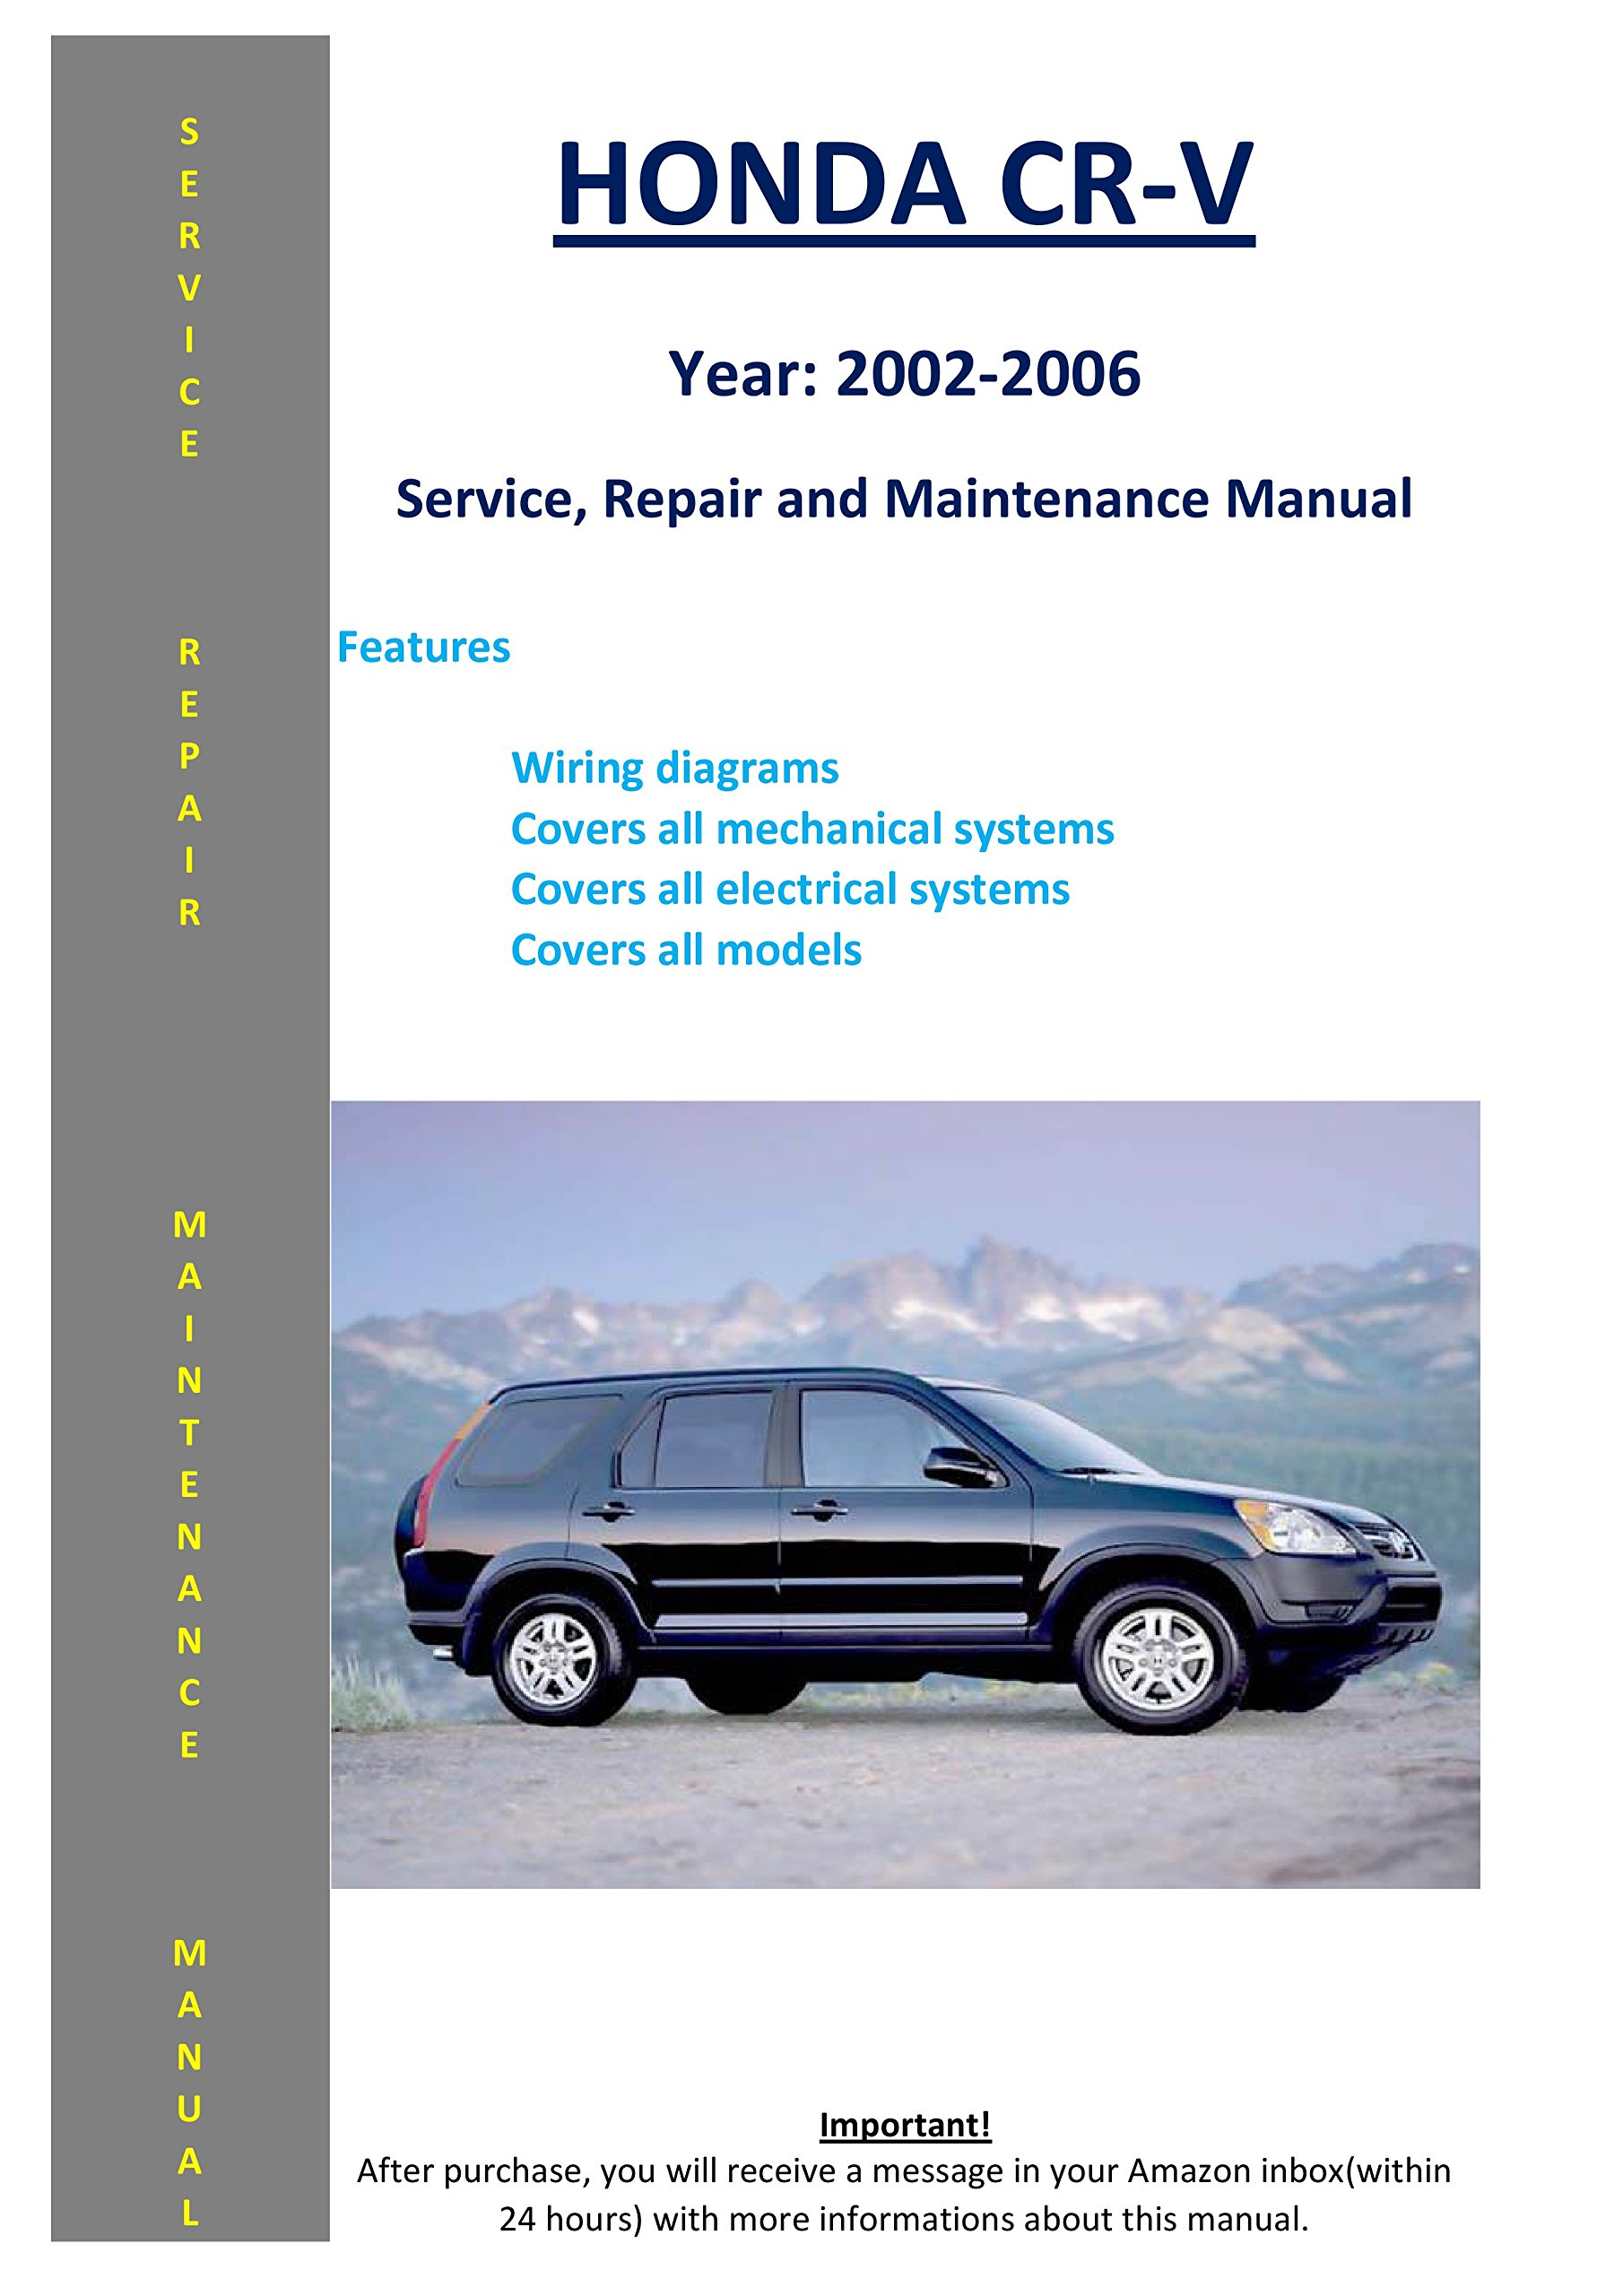 Honda Cr-v From 2002-2006 Service Repair Maintenance Manual: SoftAuto  Manuals: 5858006536611: Amazon.com: Books